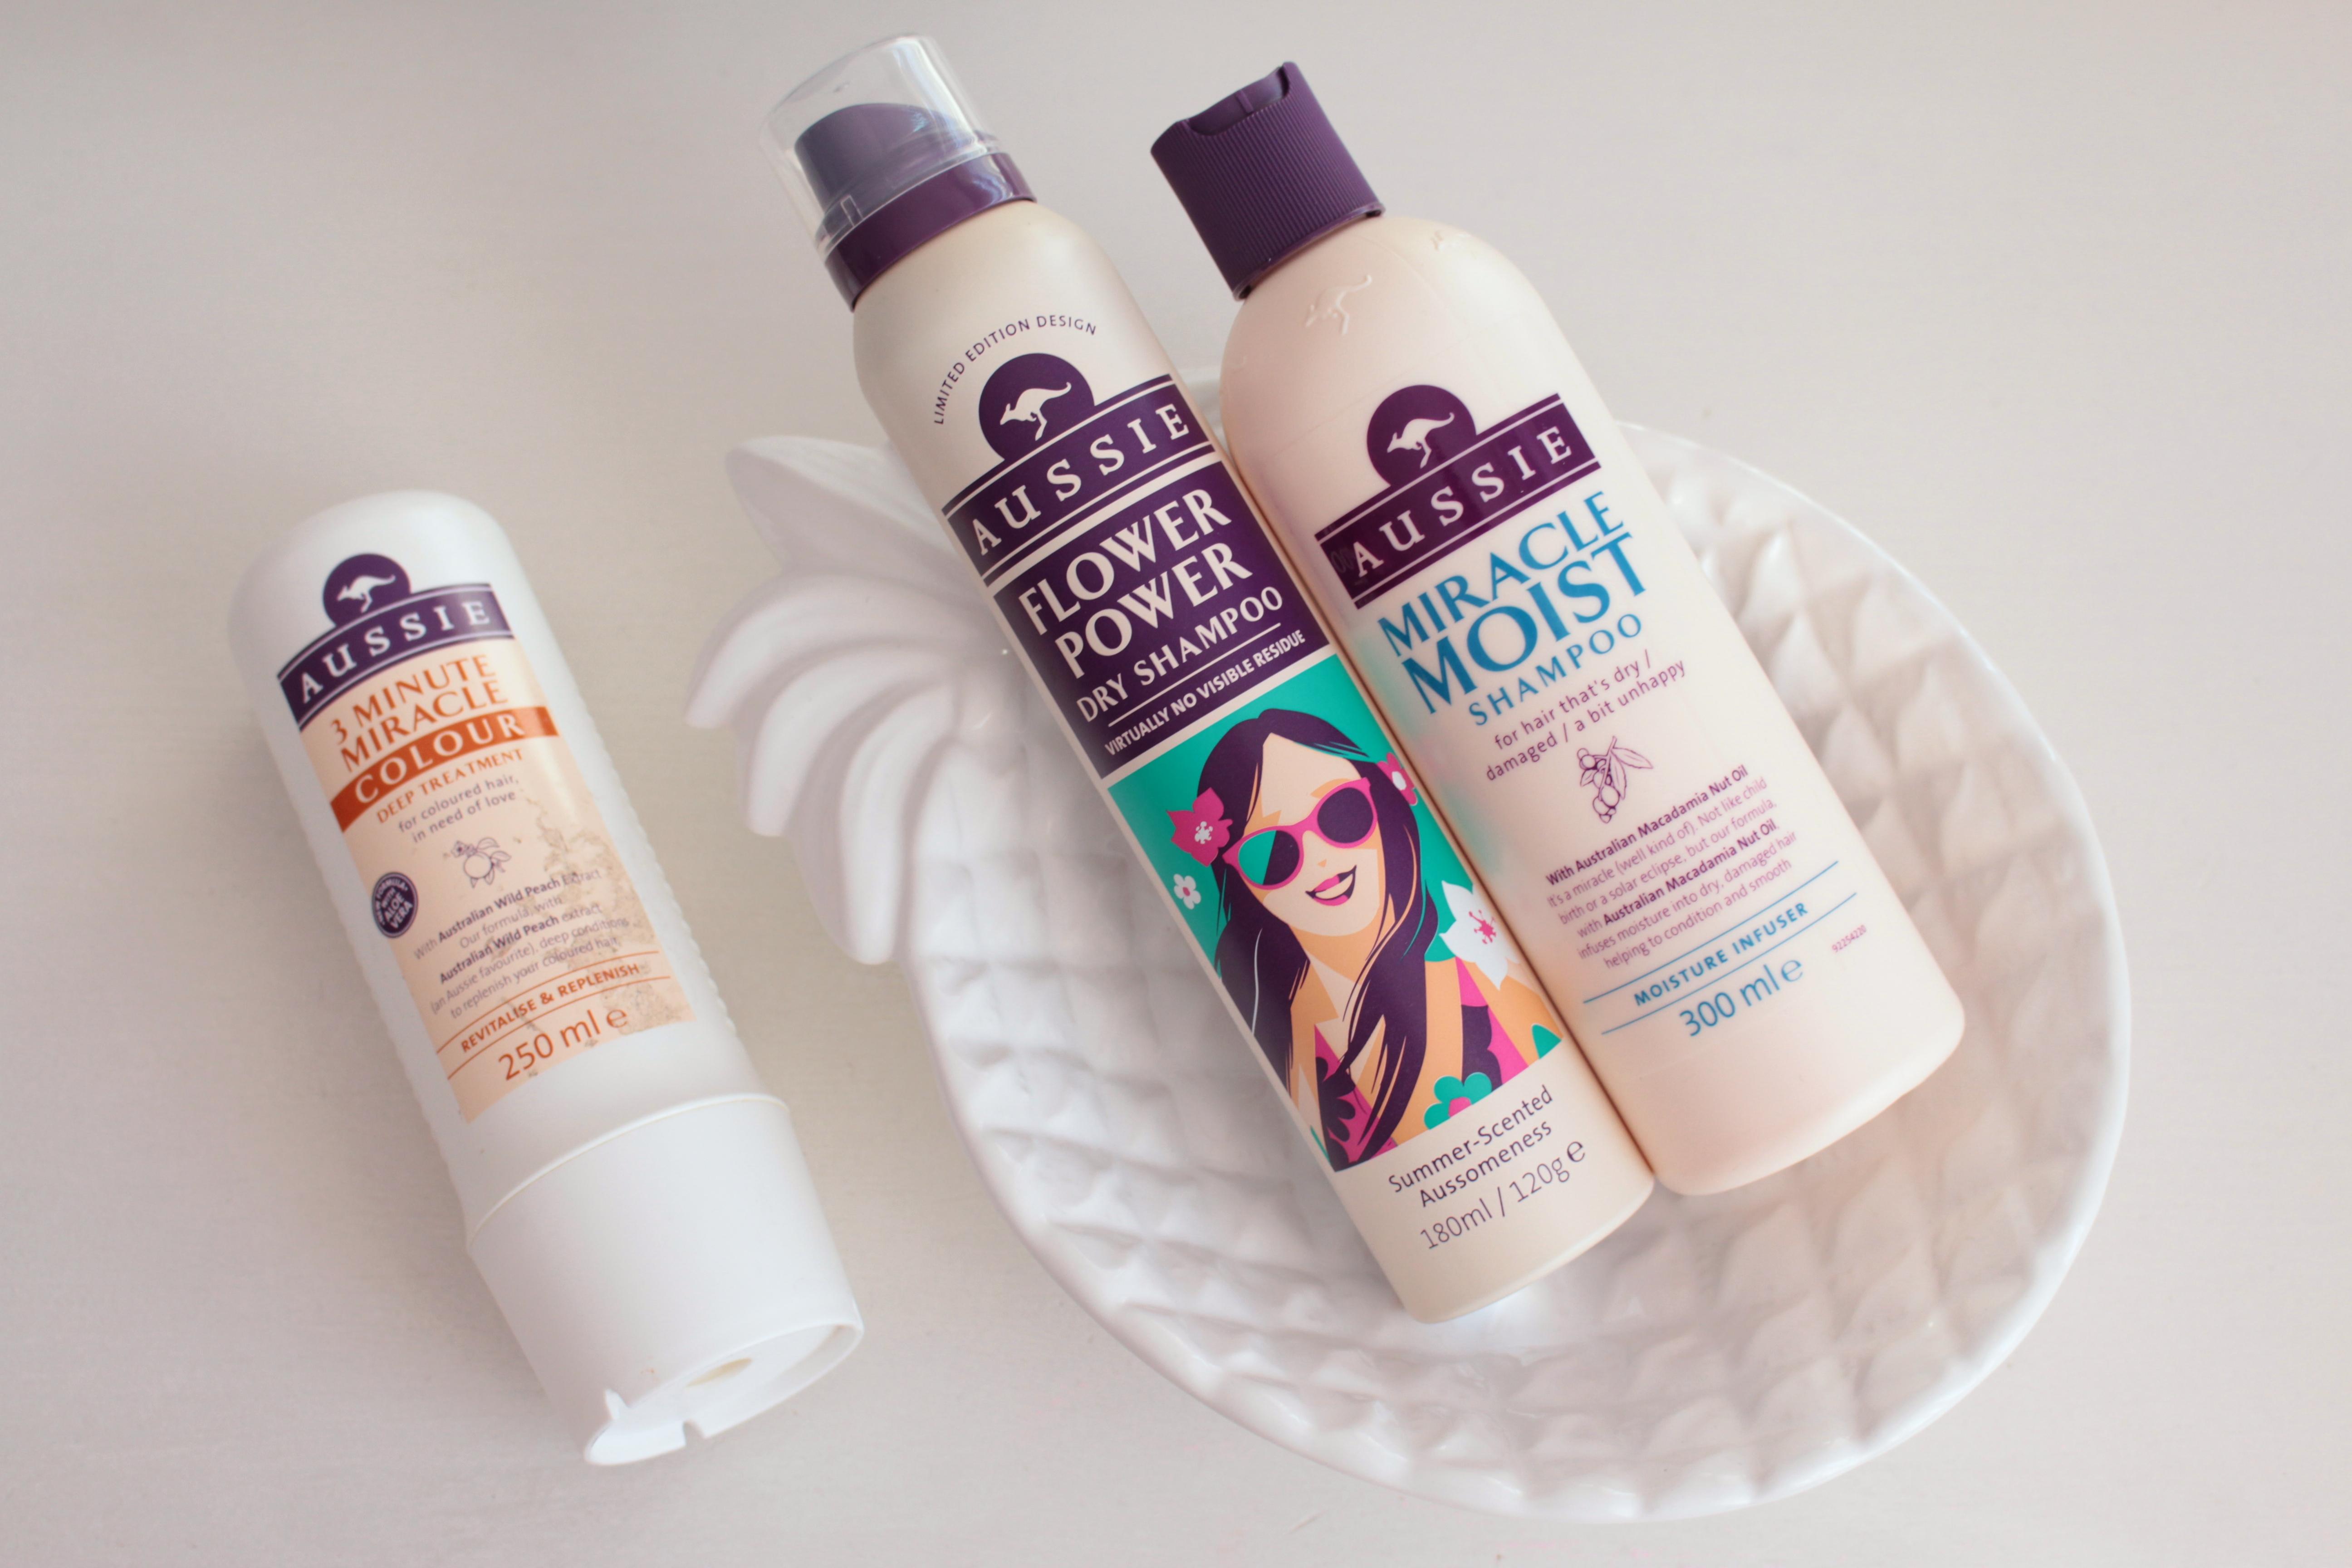 Уход за волосами с косметикой Aussie